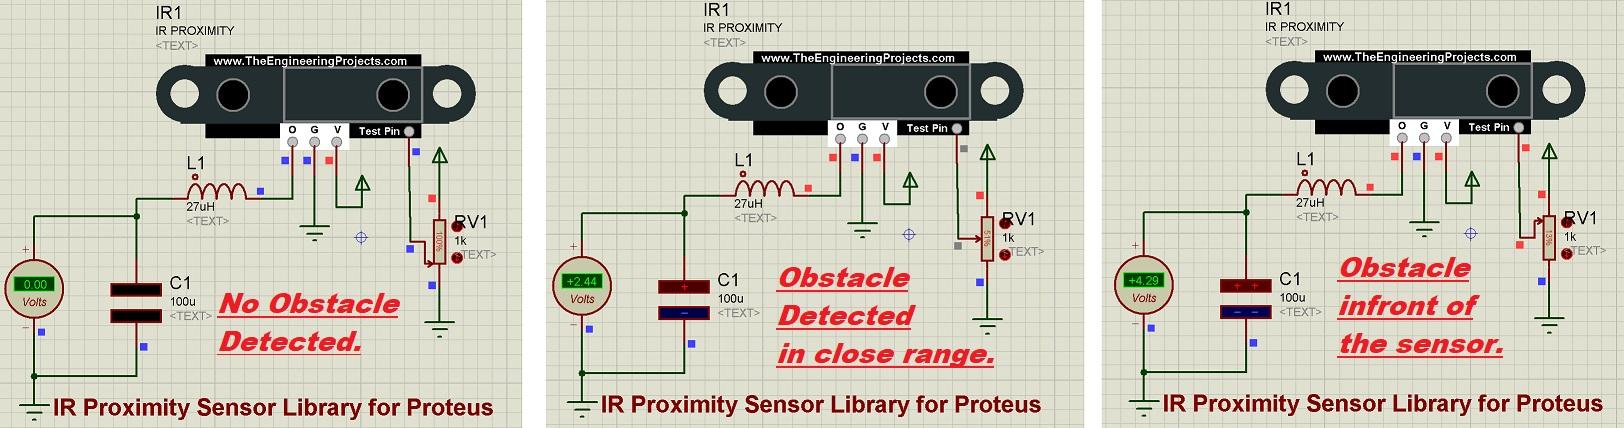 IR Proximity Sensor Library for Proteus, IR Proximity sensor, proteus simulation of ir proximity, ir ini proteus, proteus ir sensor, proximity sensor proteus